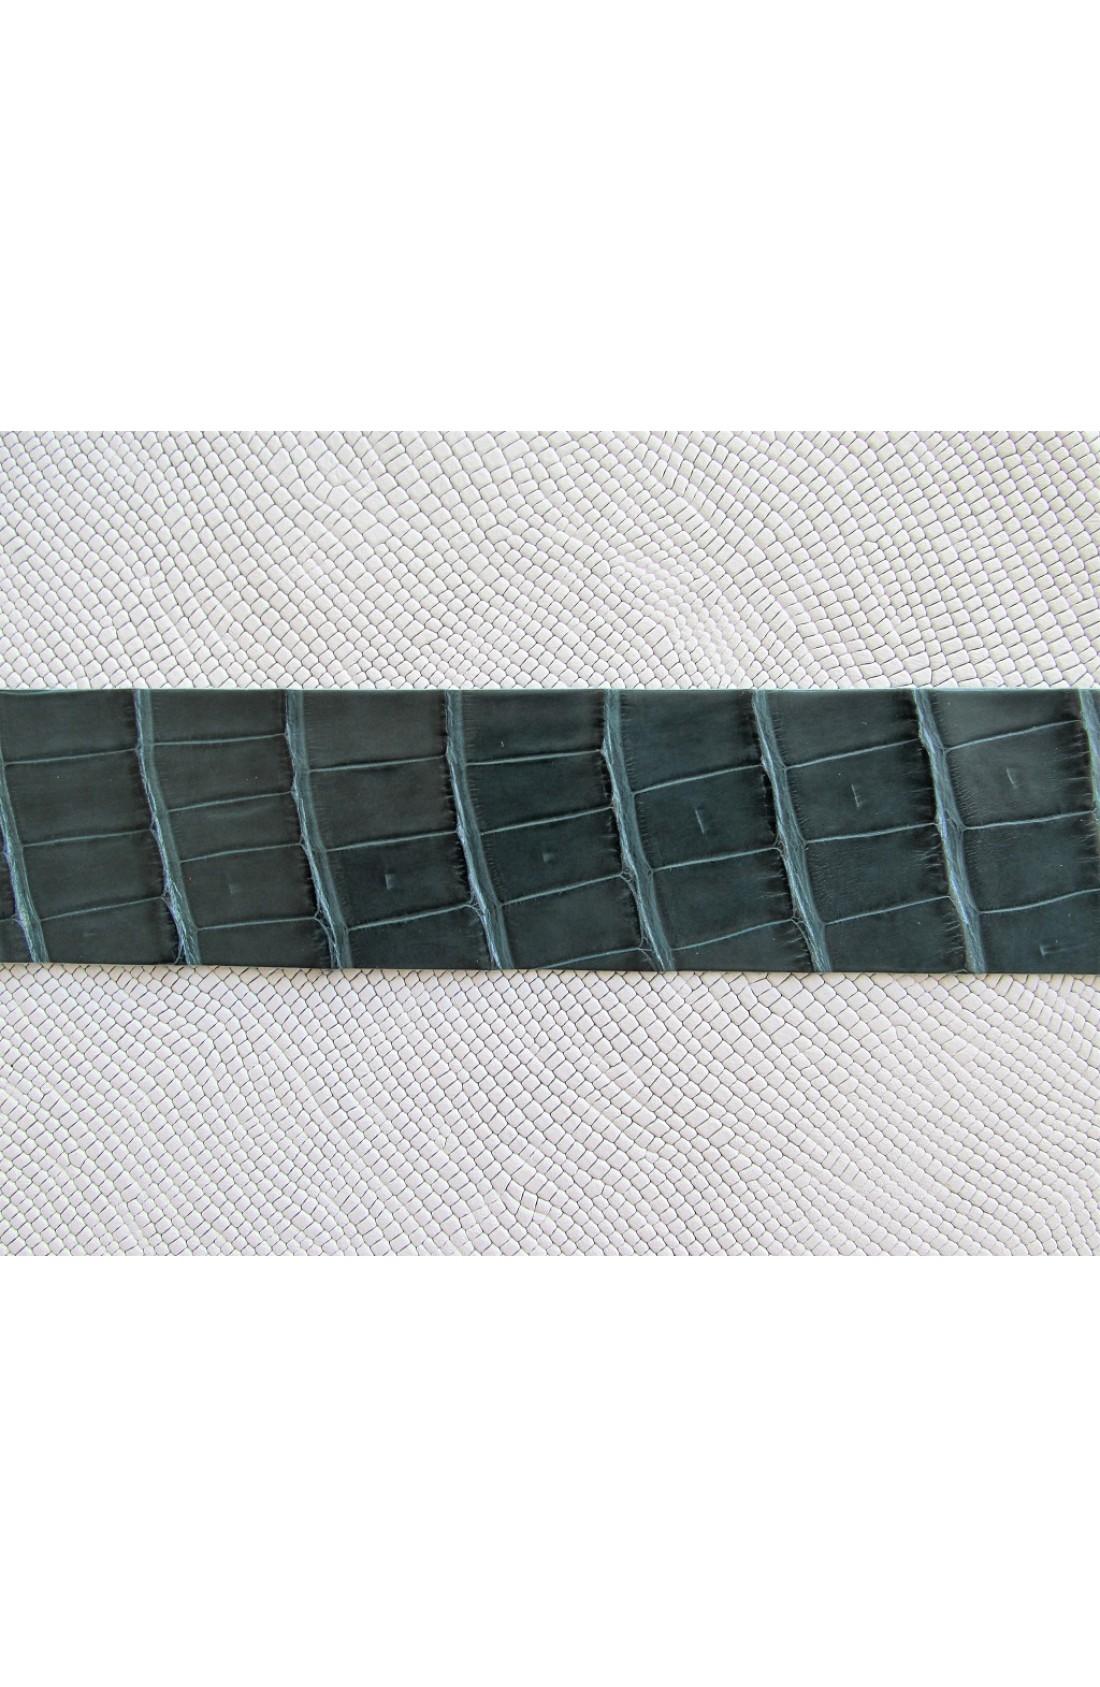 art. 12 COCCODRILLO VERO pancia alligatore louisiana var.65 verde marino